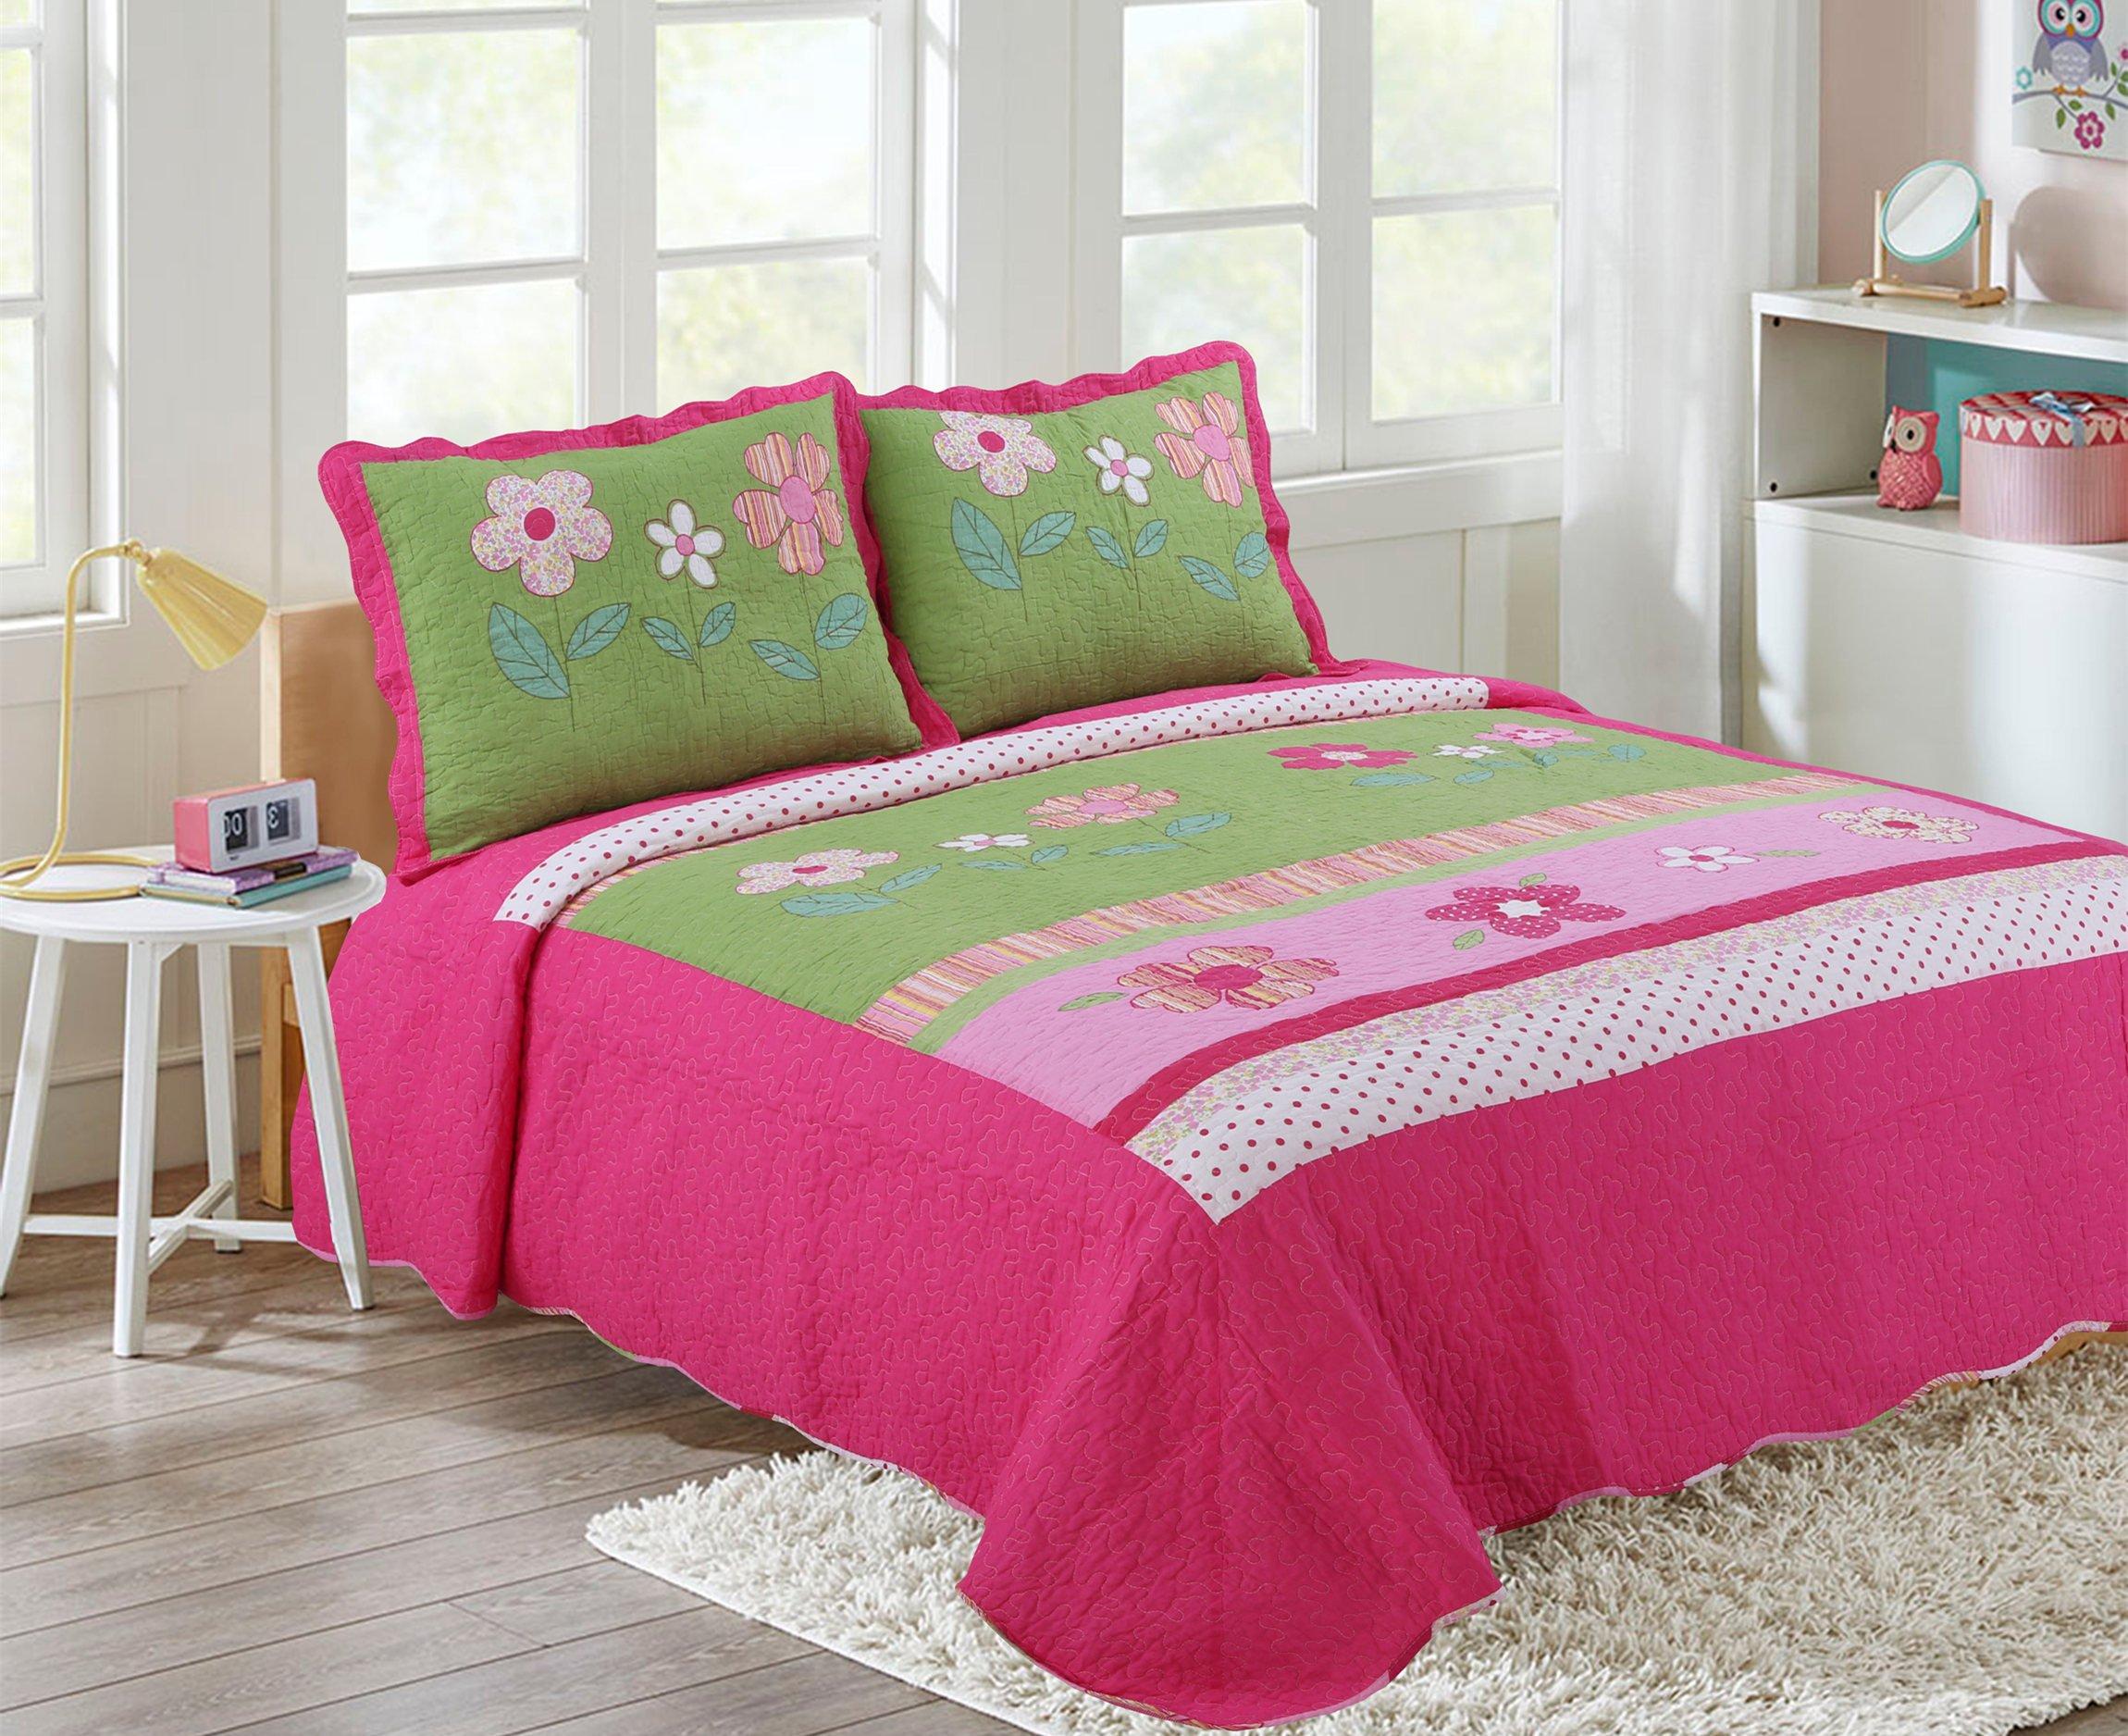 HNNSI Girls Flower Kids Quilt Bedspread Set Queen Size 3PCS,100% Cotton Girls Comforter Kids Bedding sets, Kids Girls Bed Sheet Sets (Queen, Pink floral)